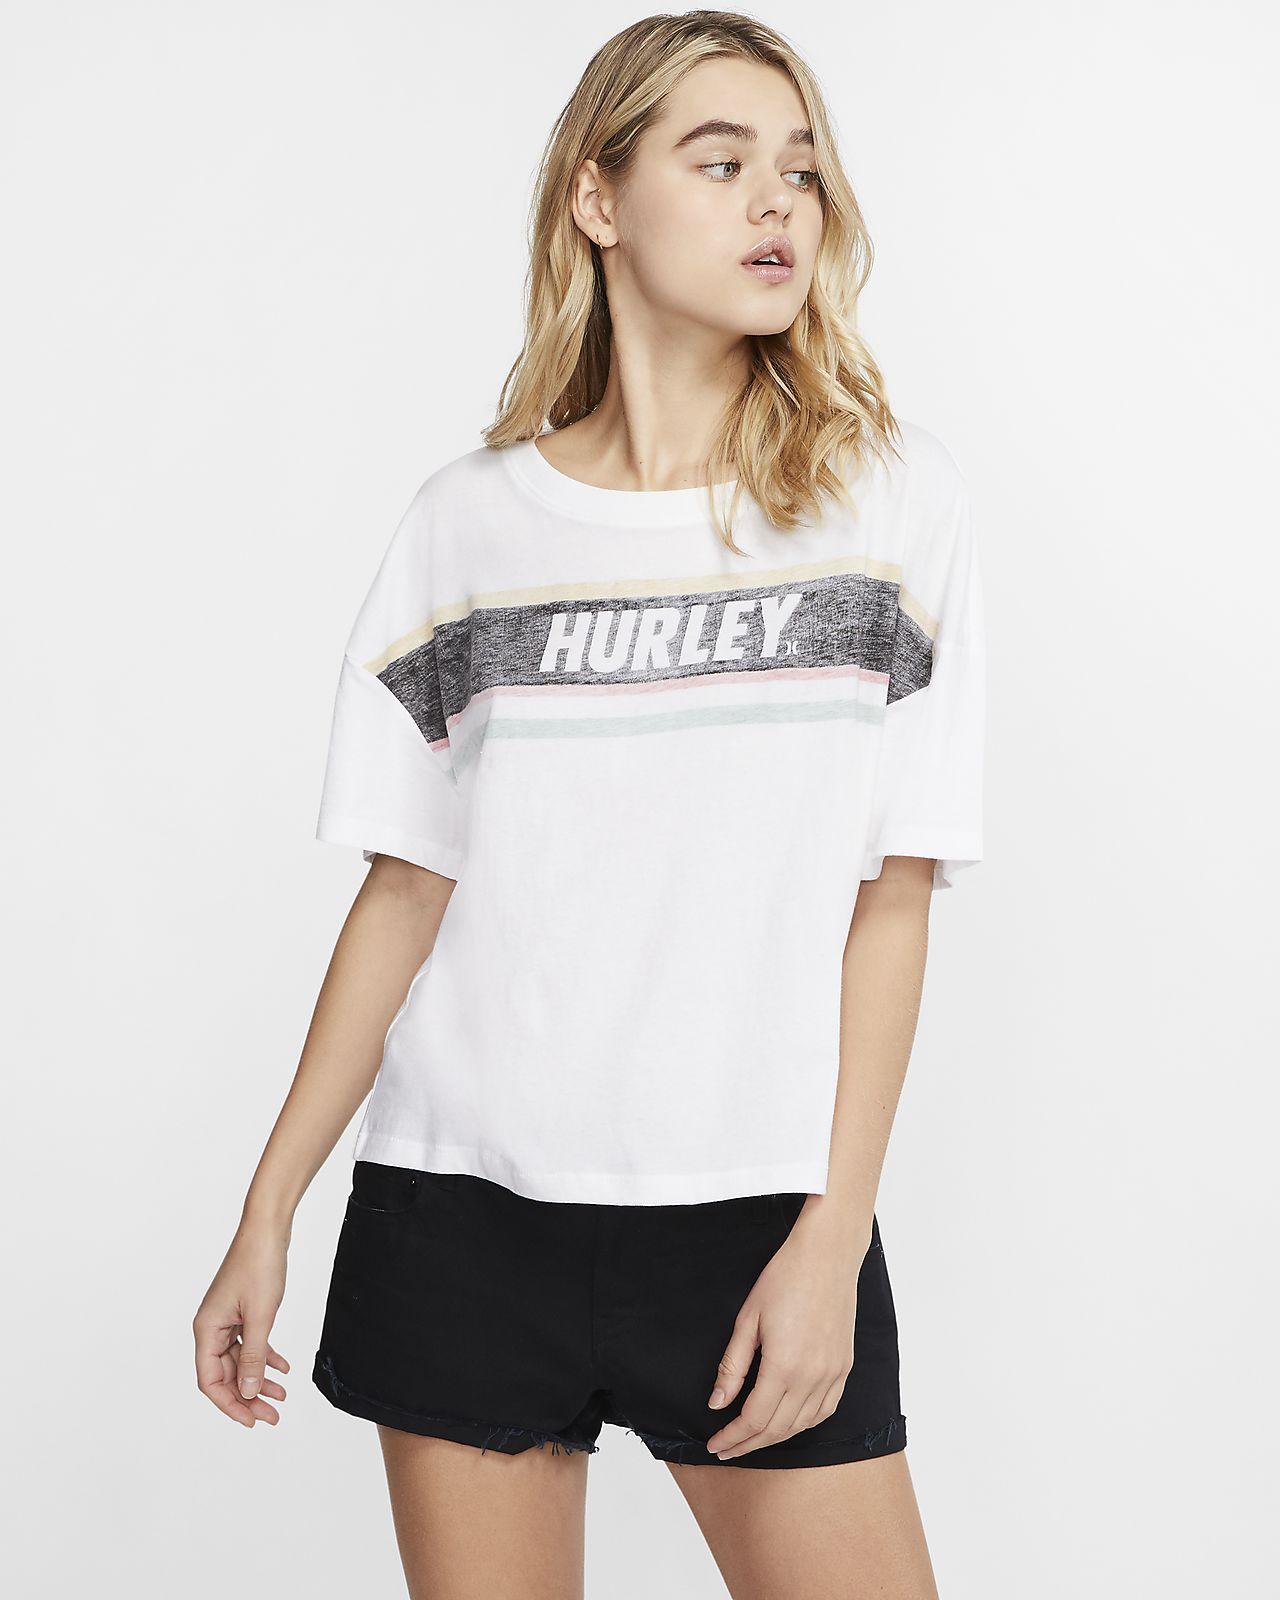 Hurley Sporty Stripes Flouncy Camiseta - Mujer